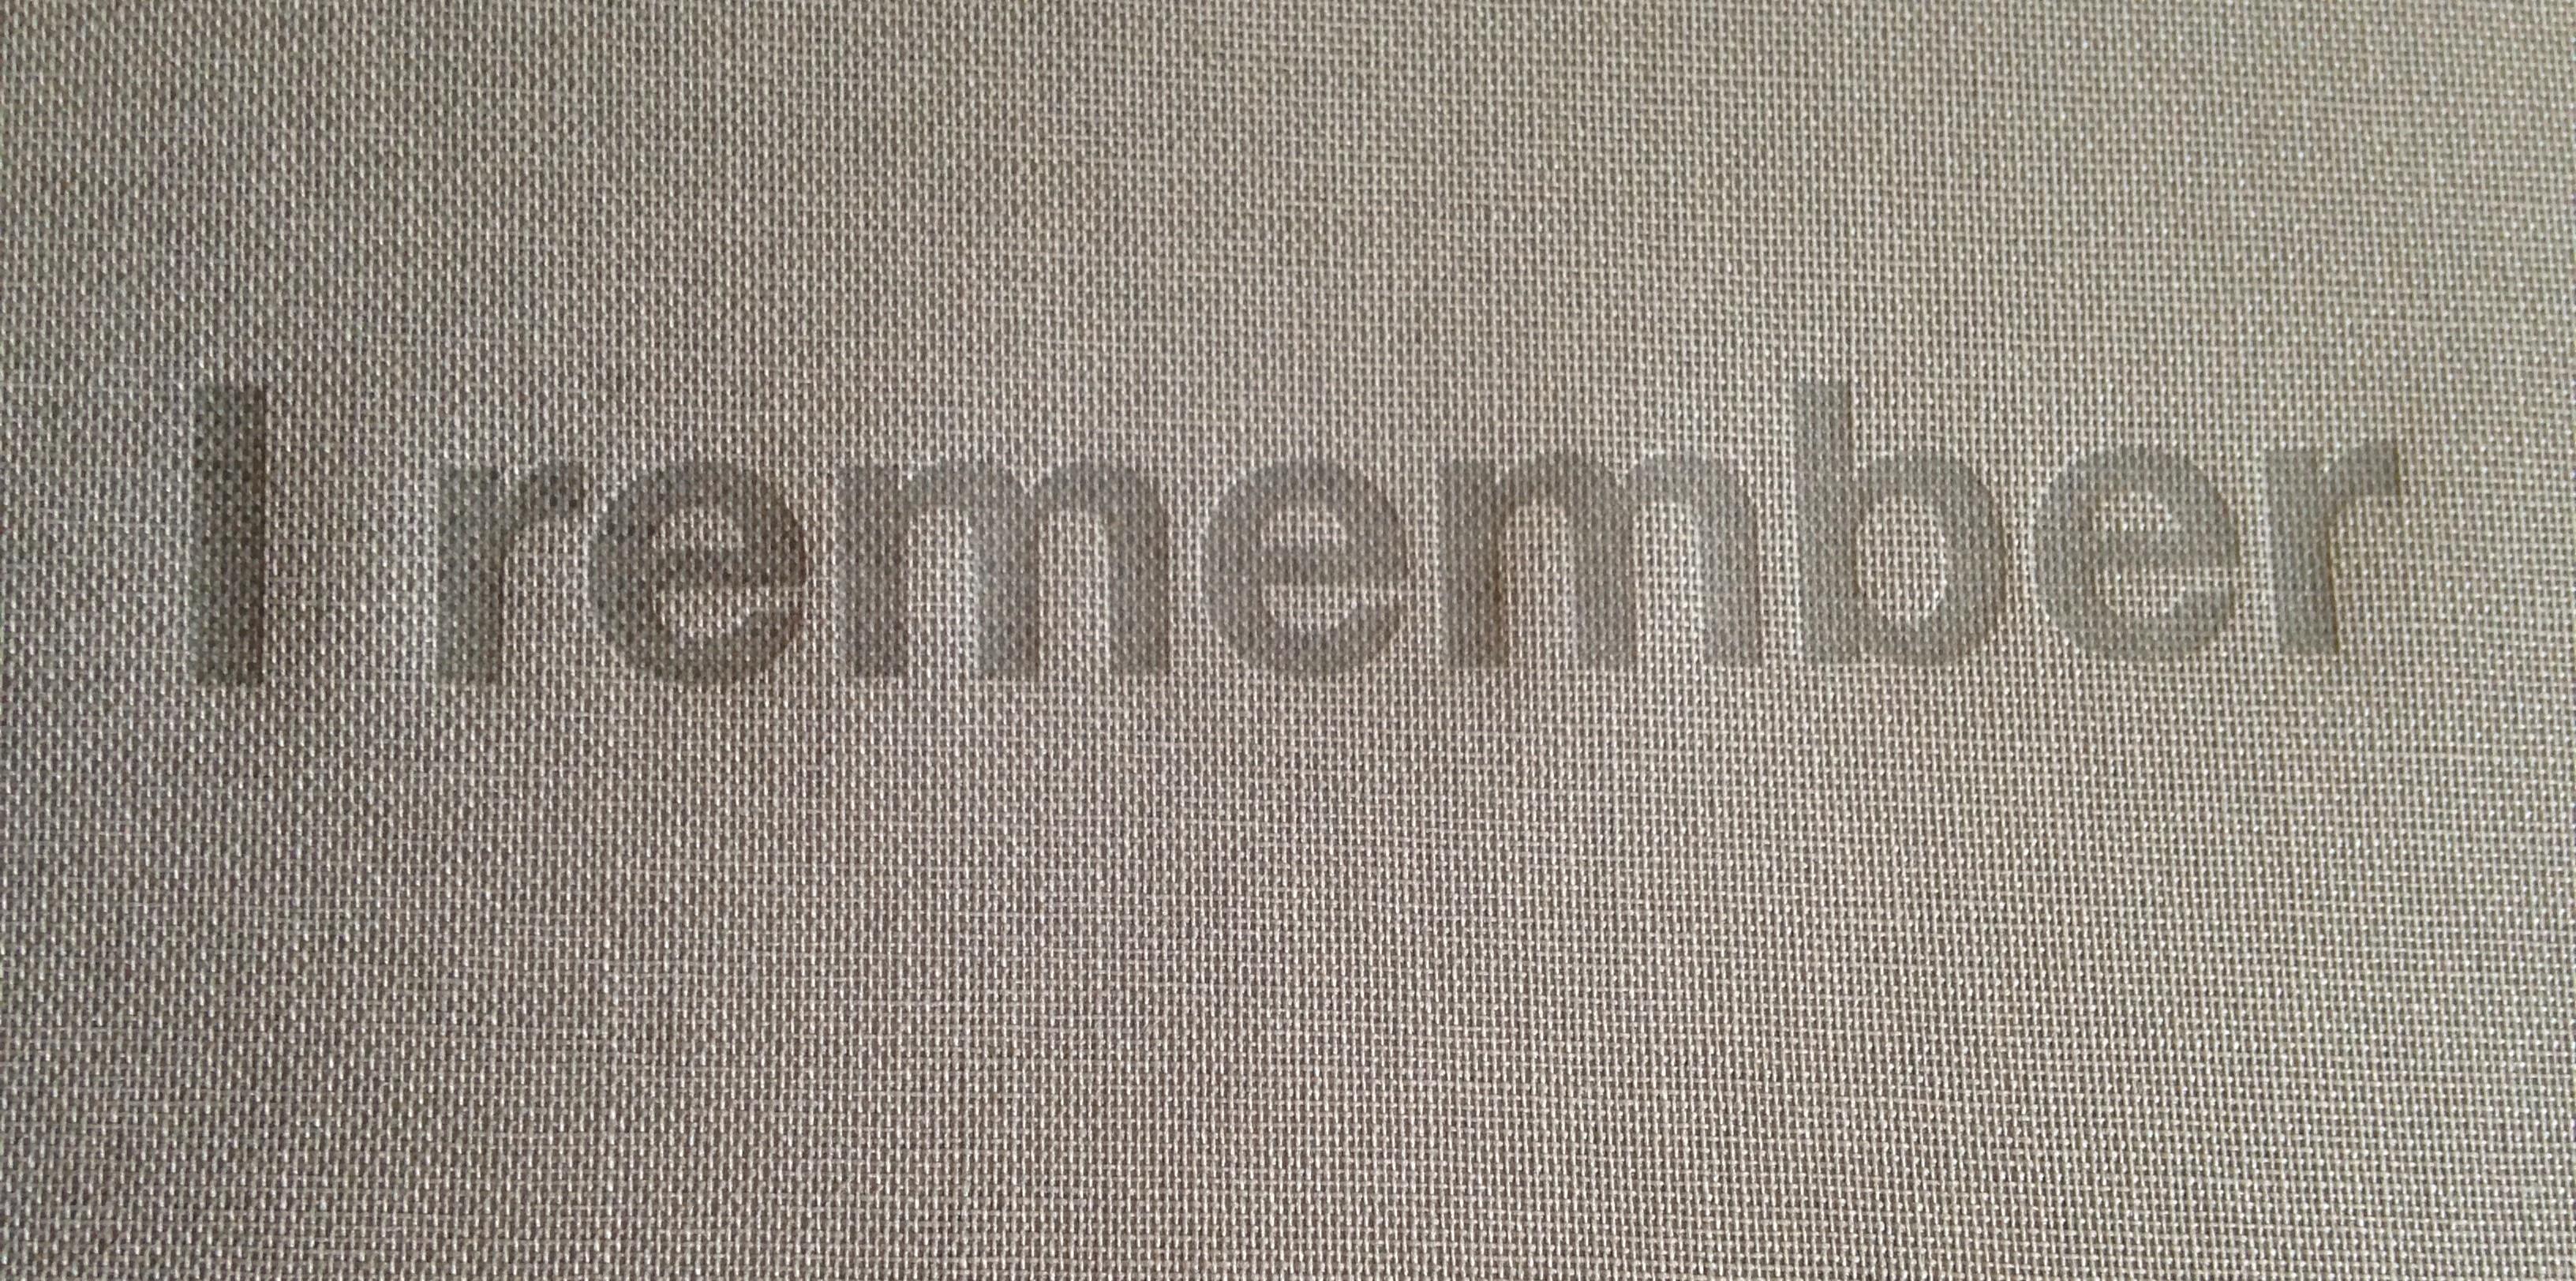 polymer blind stamp on Iris bookcloth